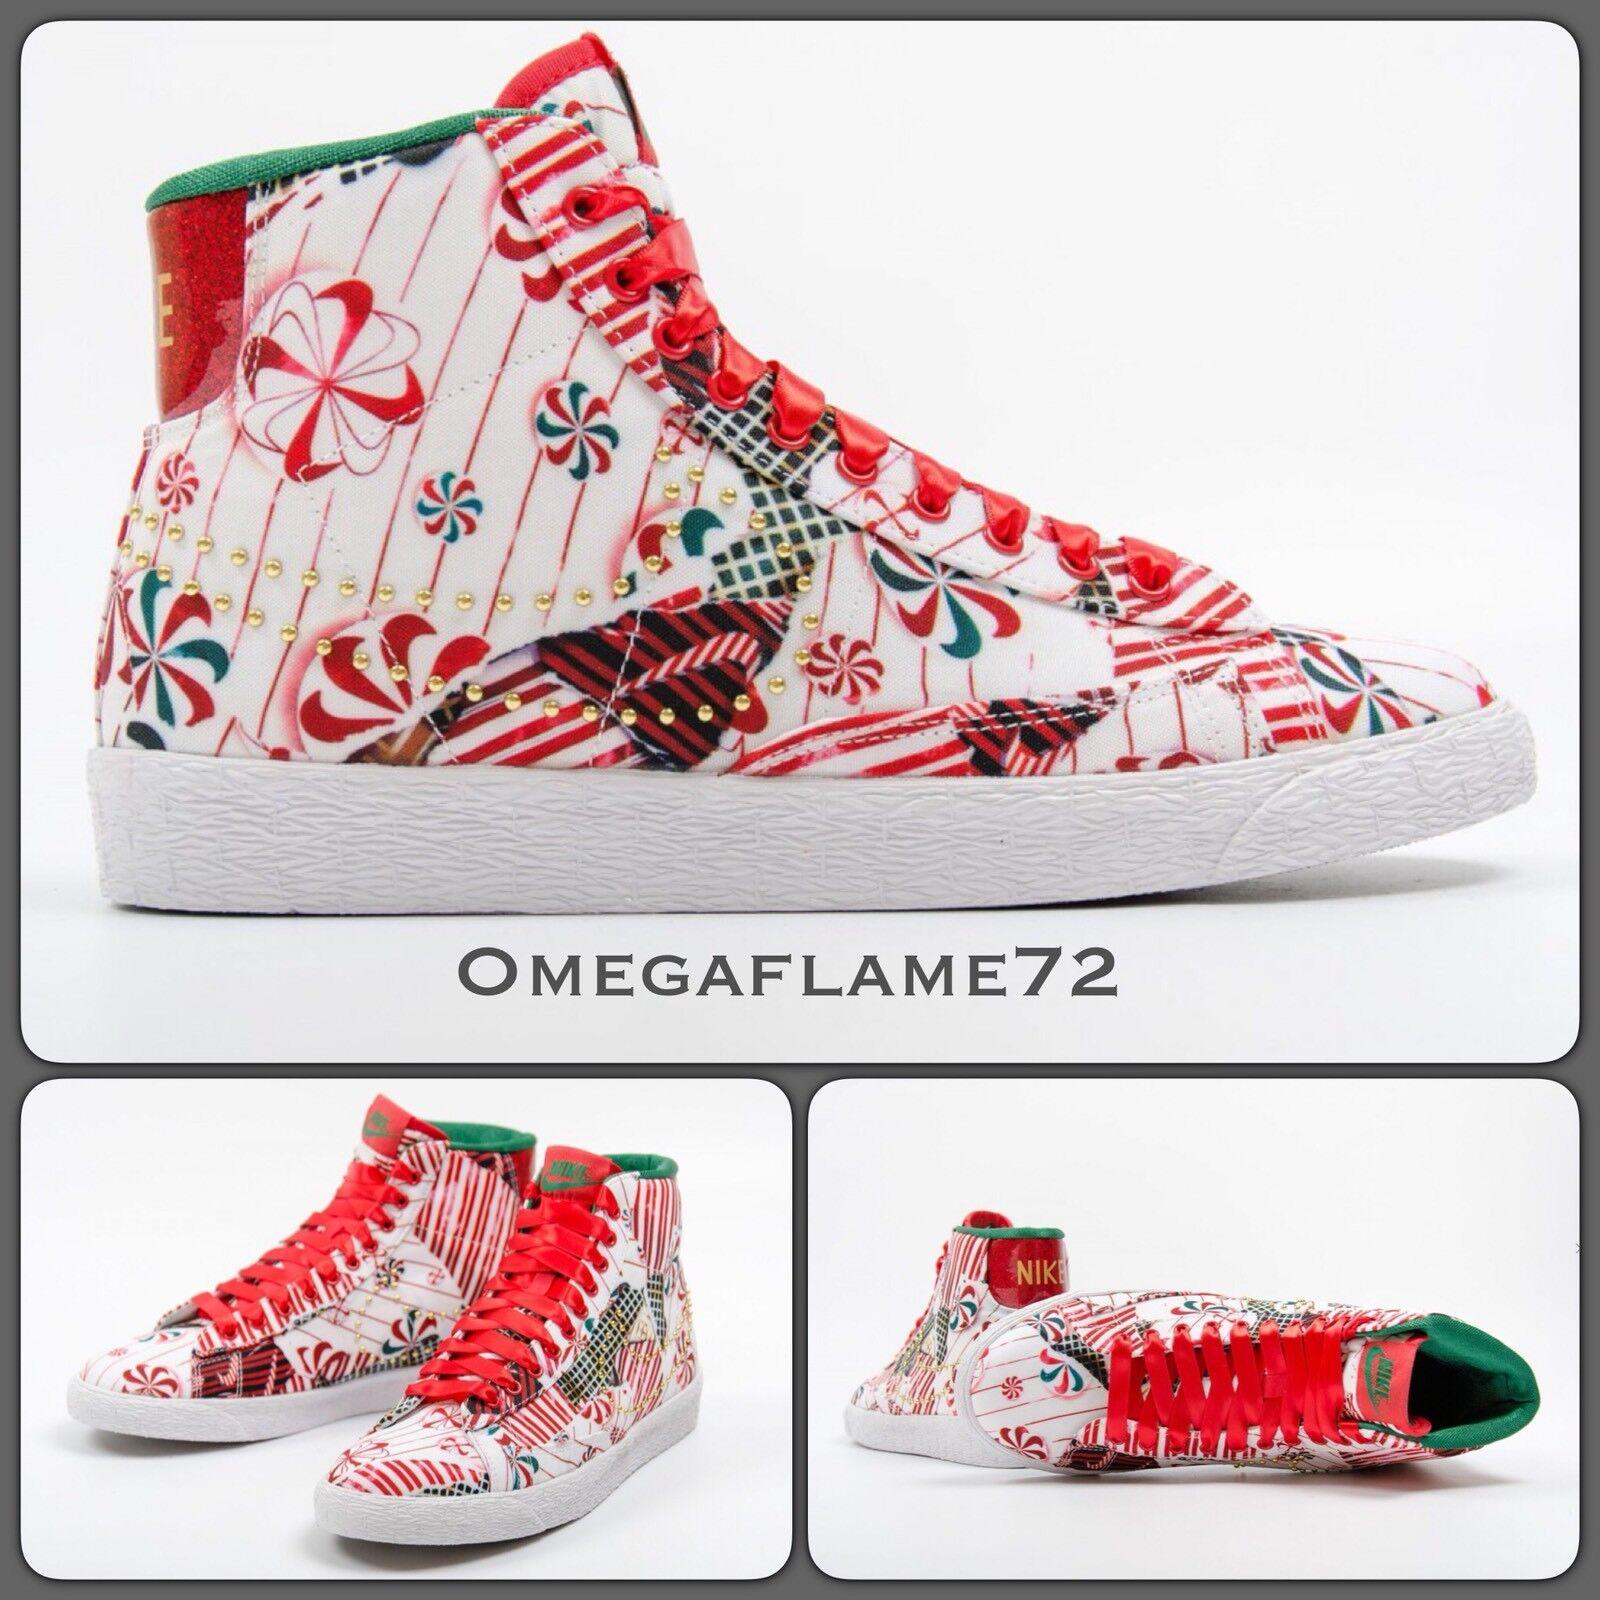 Nike Blazer Mid Premium QS 637990-600, UK 5.5, EU 39, Wrap US 8, Christmas Gift Wrap 39, 332b47